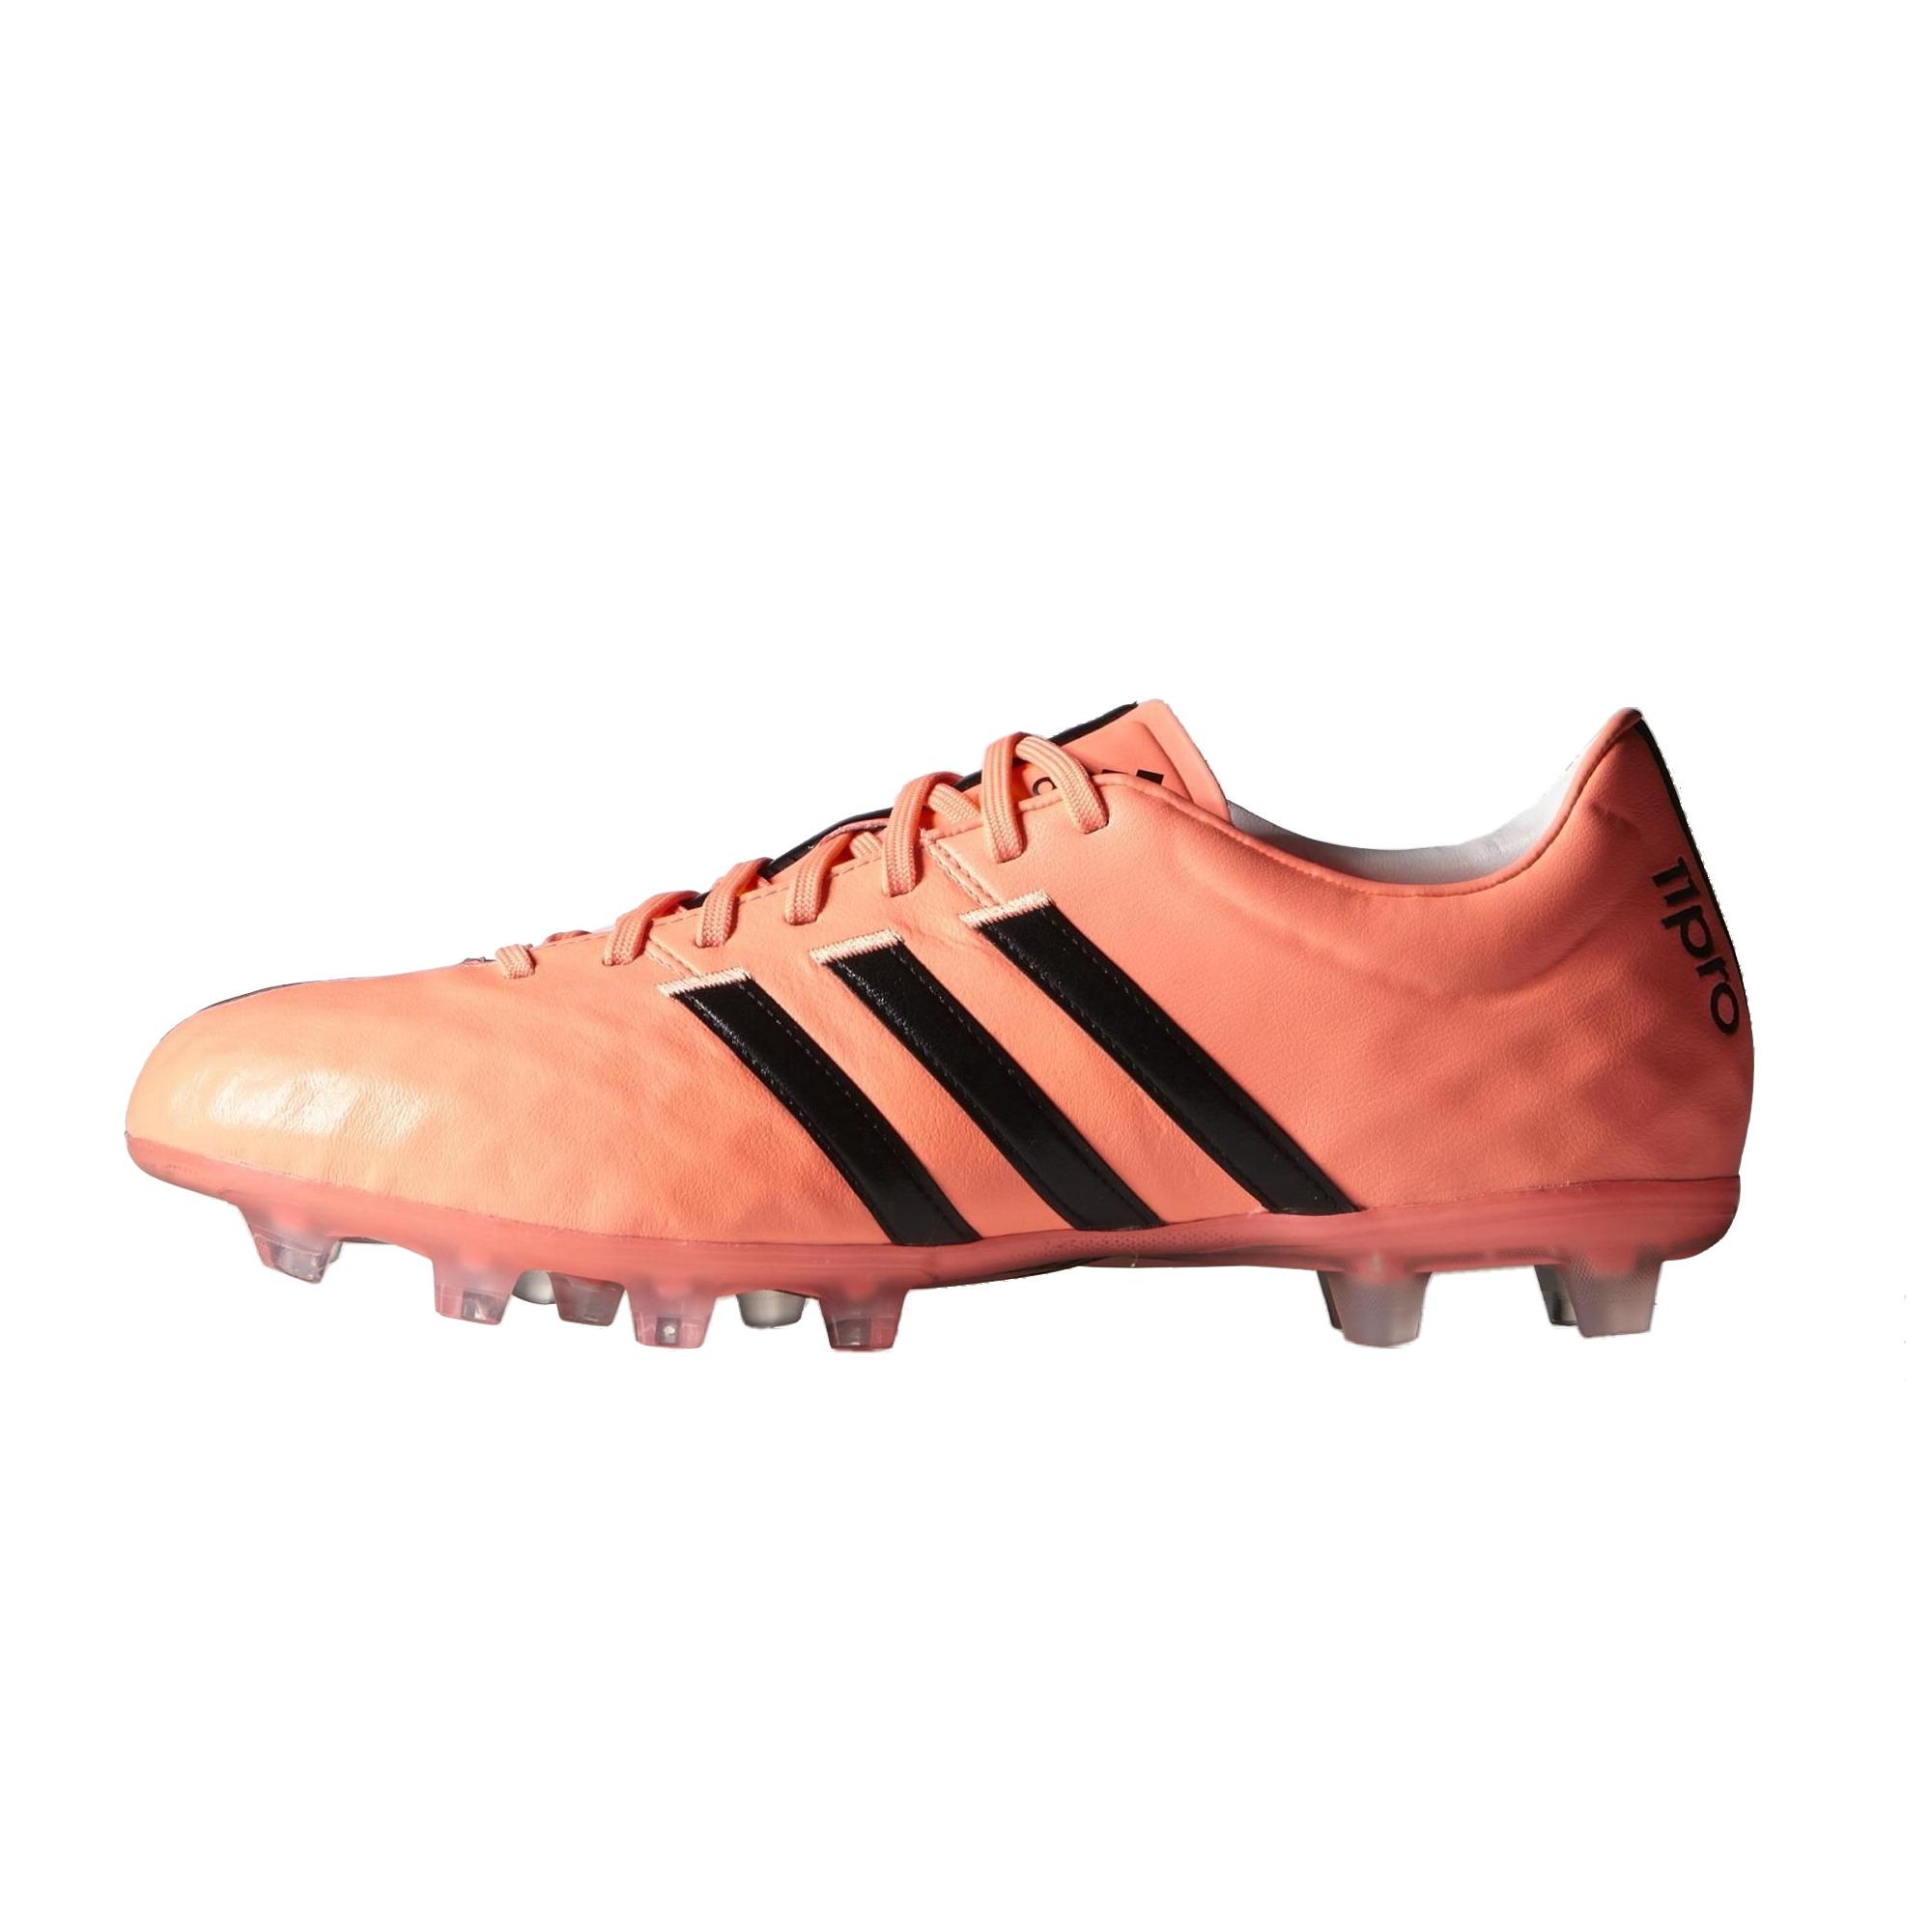 Adidas 11pro france